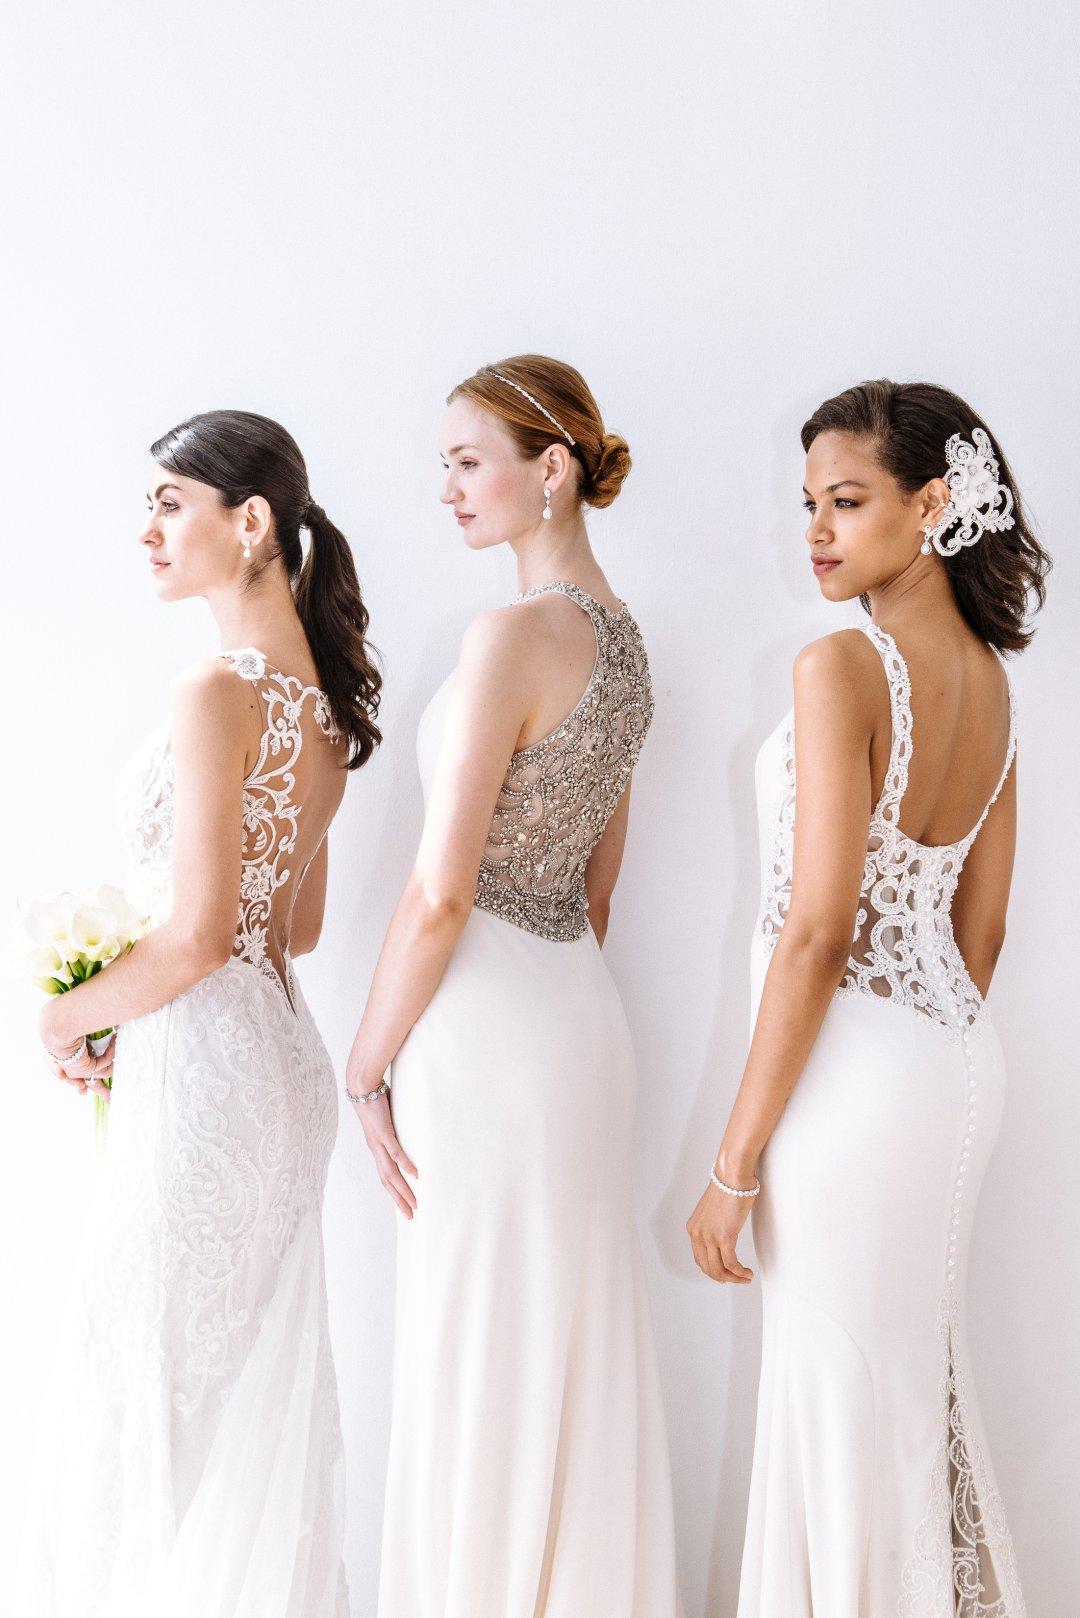 d49afdbbd9c0b Plunging Illusion Bodice Lace Wedding Dress - Davids Bridal